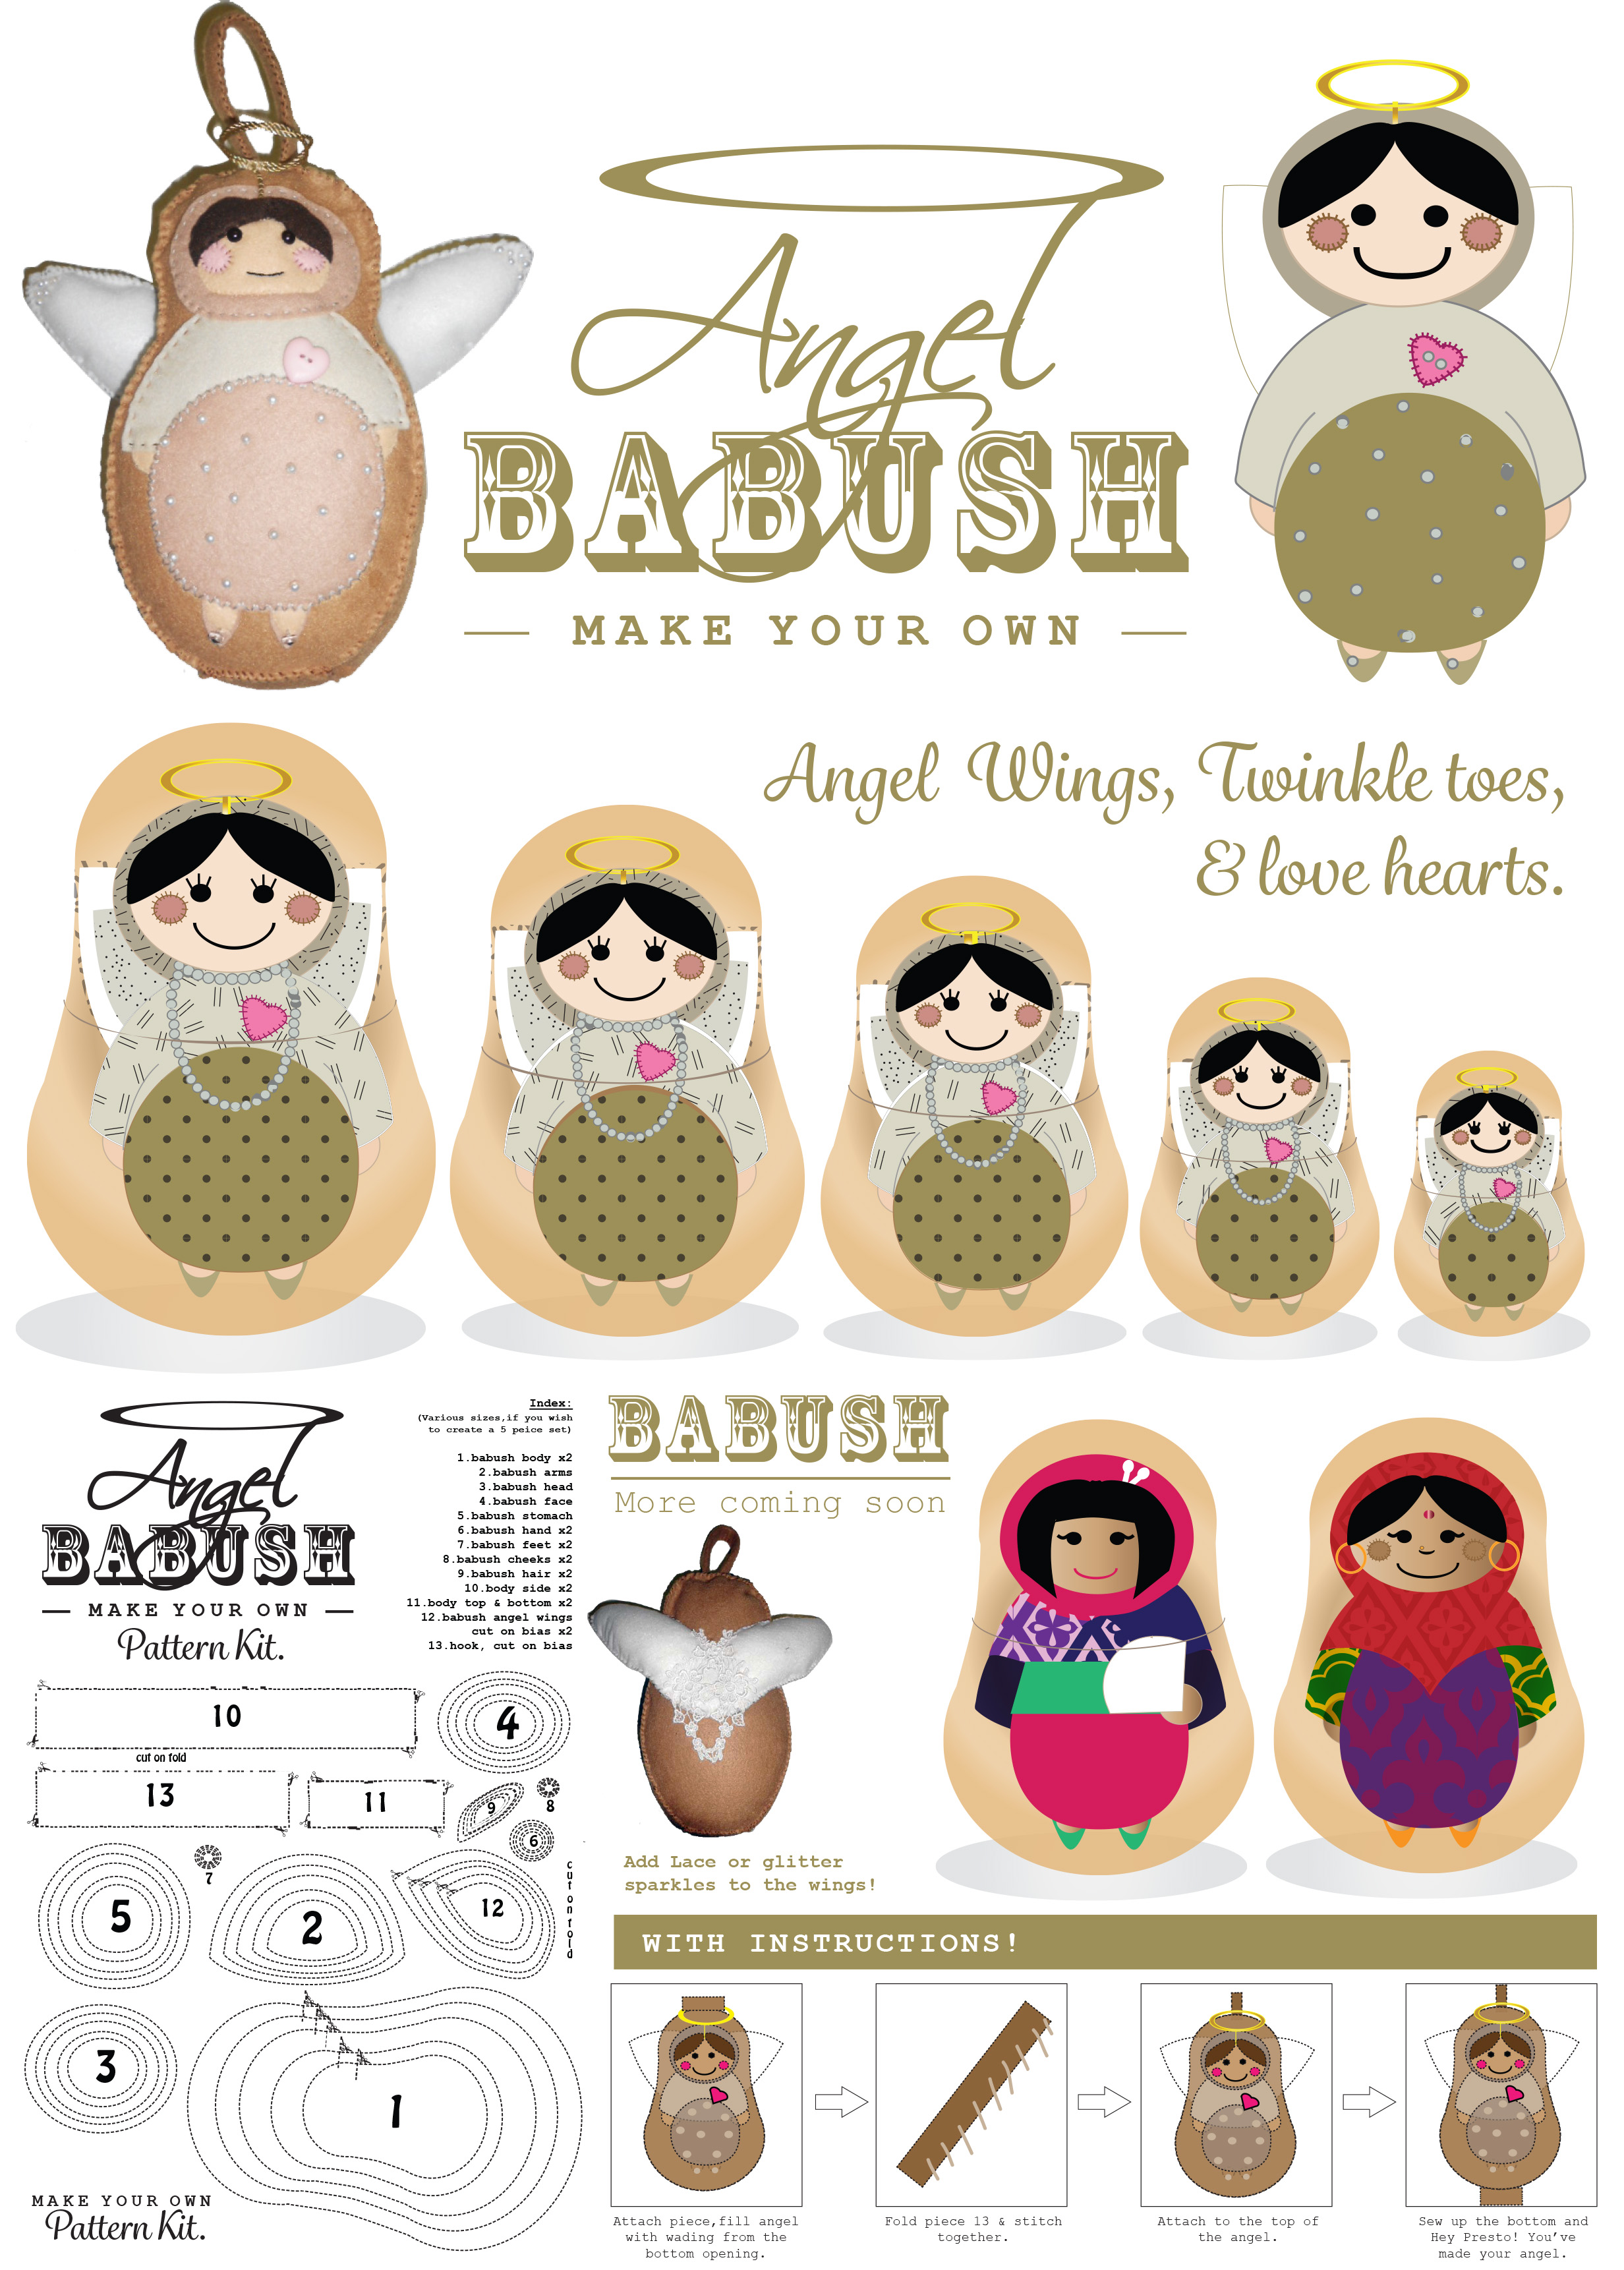 Angel Babush